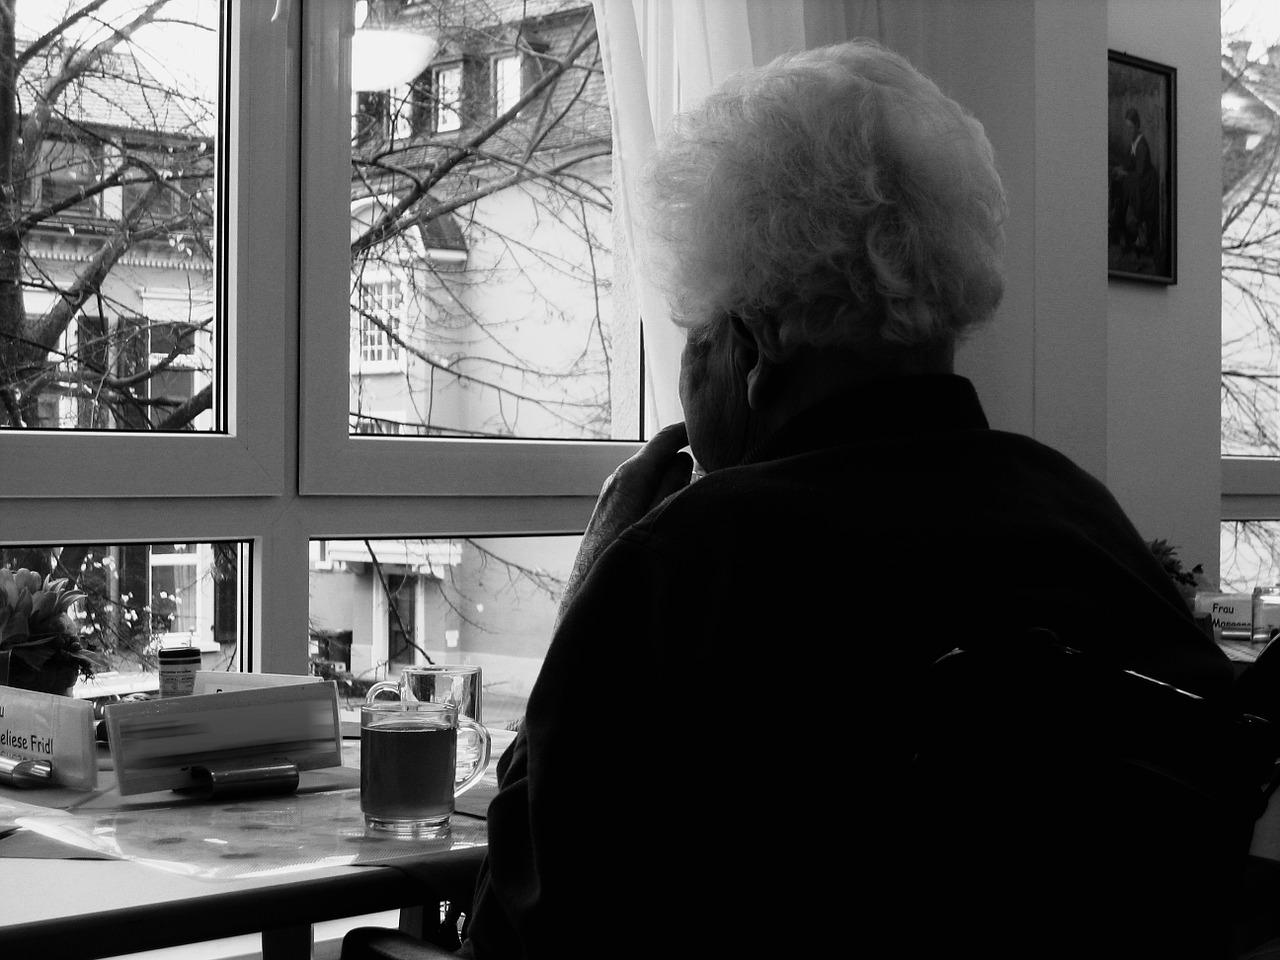 Maladie d'alzheimer : agir en amont